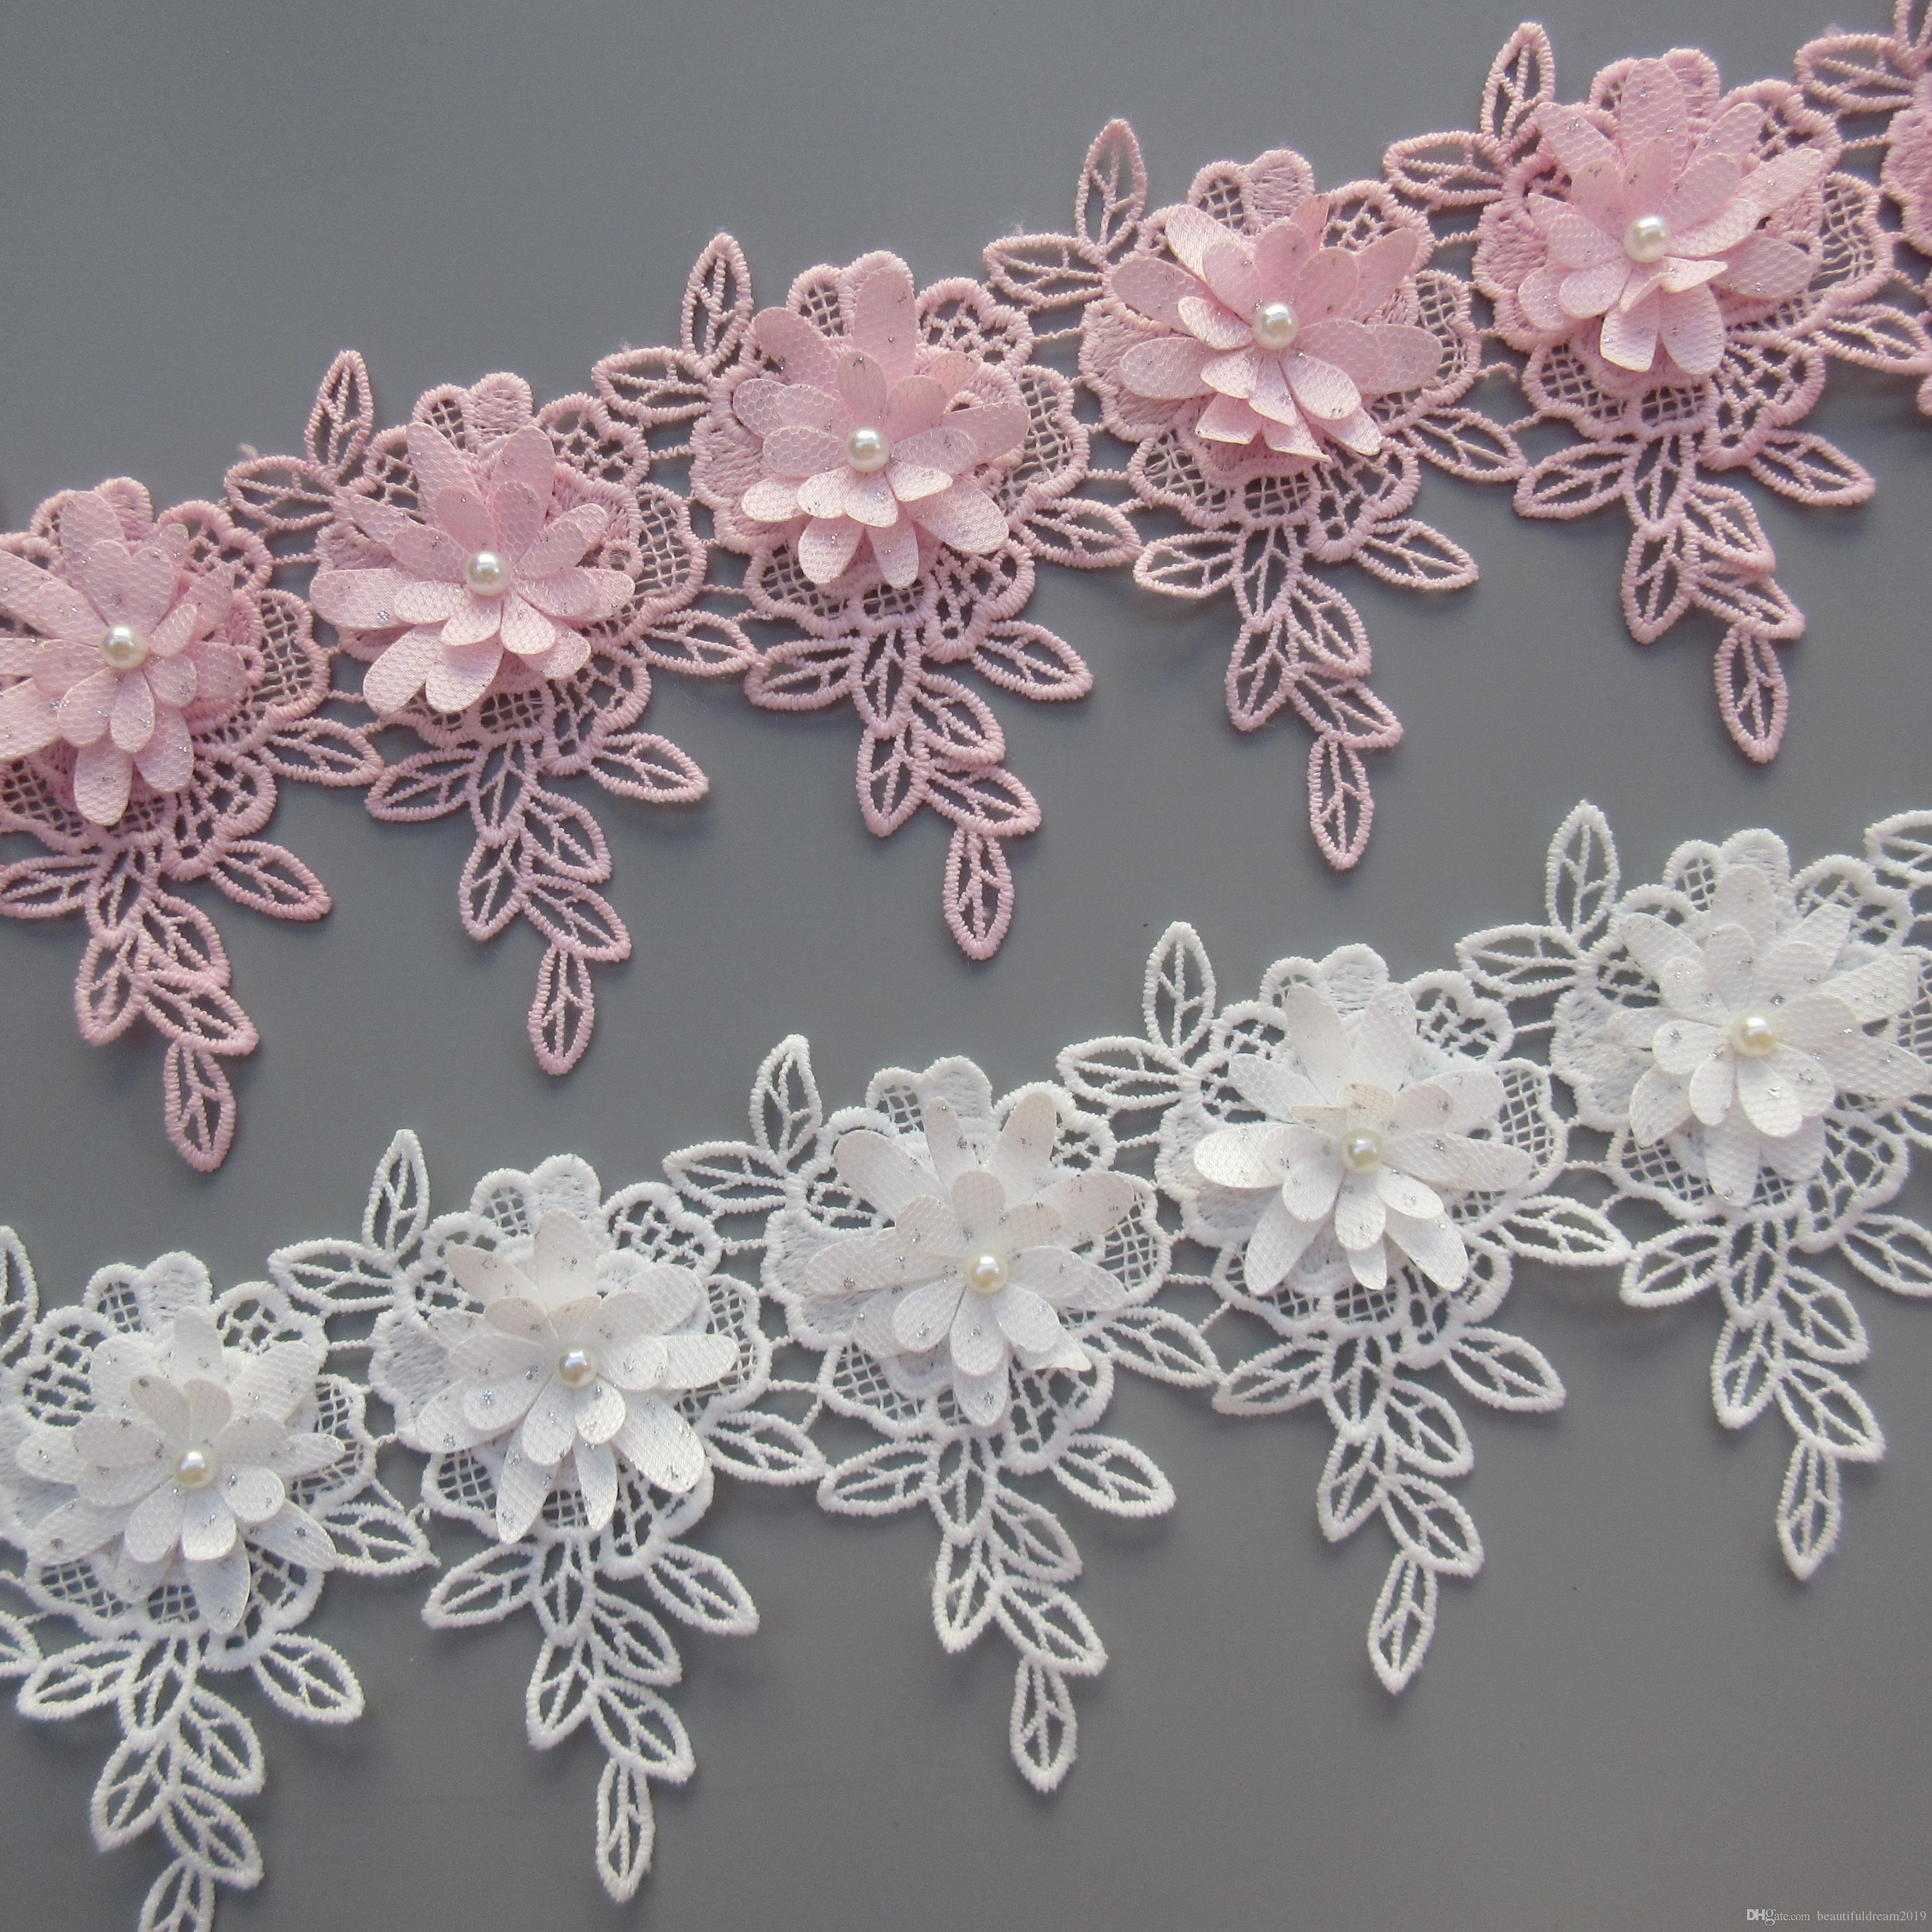 1 yard Flower Diamond Pearl Leaves Milk Fiber Lace Edge Trim Ribbon Sewing Craft